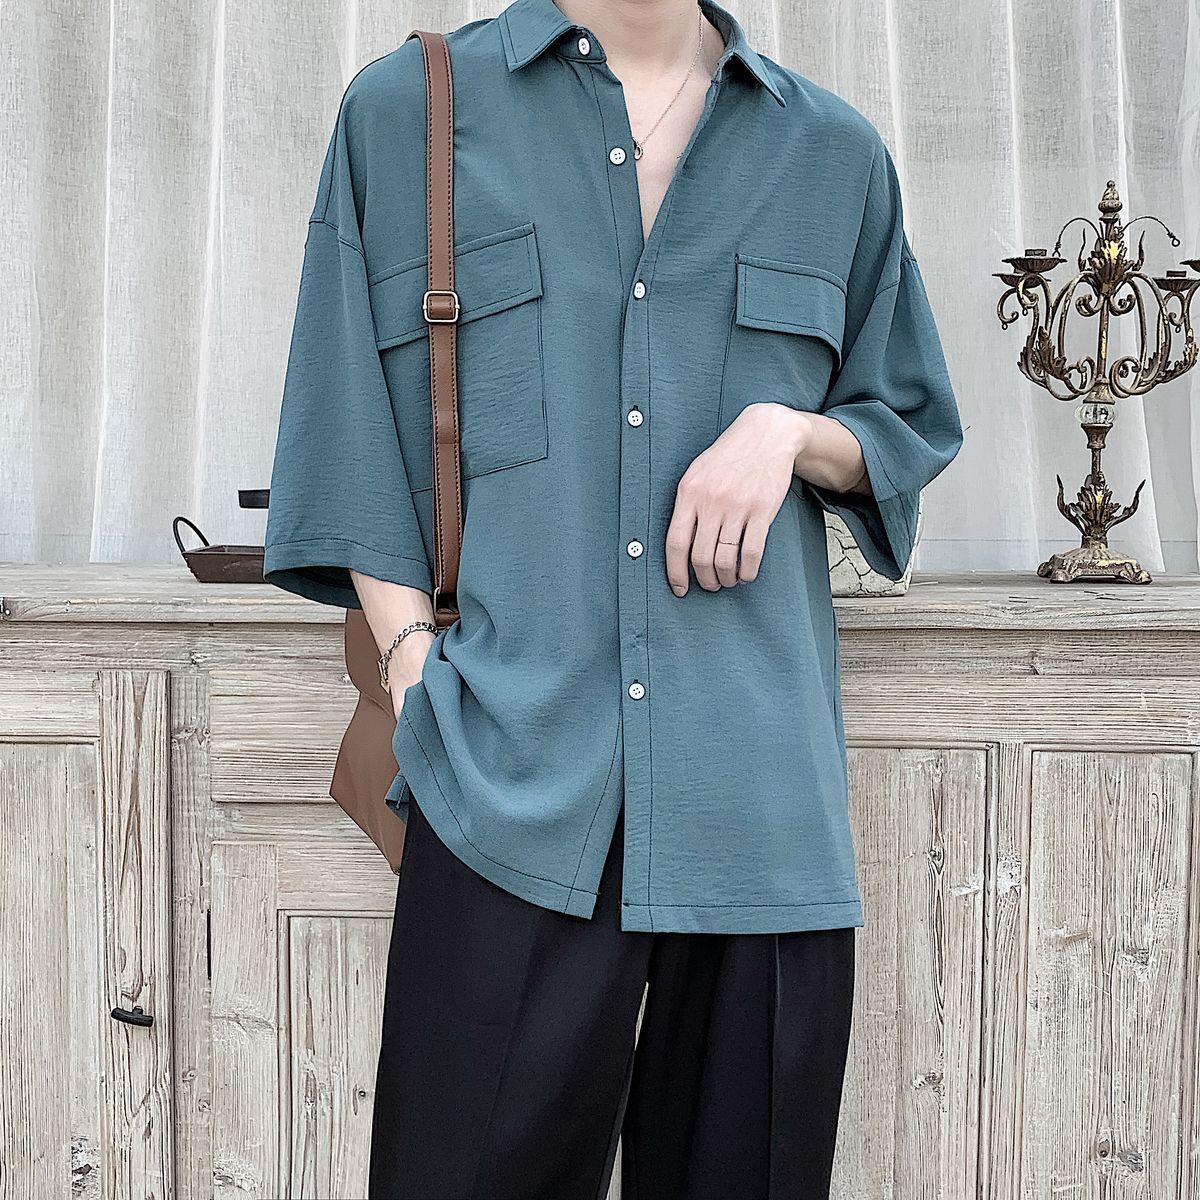 2020 Men's 7-point Sleeve Streetwear Suit Collar Hawaiian Shirt French Cuff Mens Fashion Social Shirts Camisa Masculina M-2XL